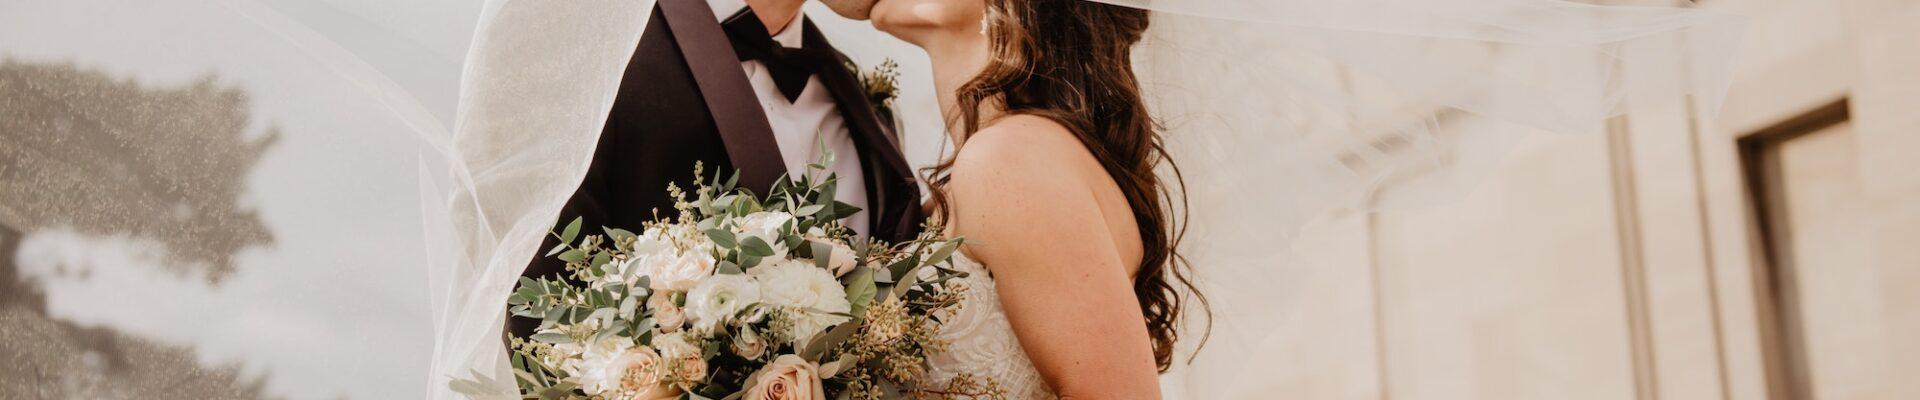 Married couple Wedding shoes | 8 Beautiful Ways to Use Satin Ribbons in Weddings | Wedding Tips | Elle Blonde Luxury Lifestyle Destination Blog